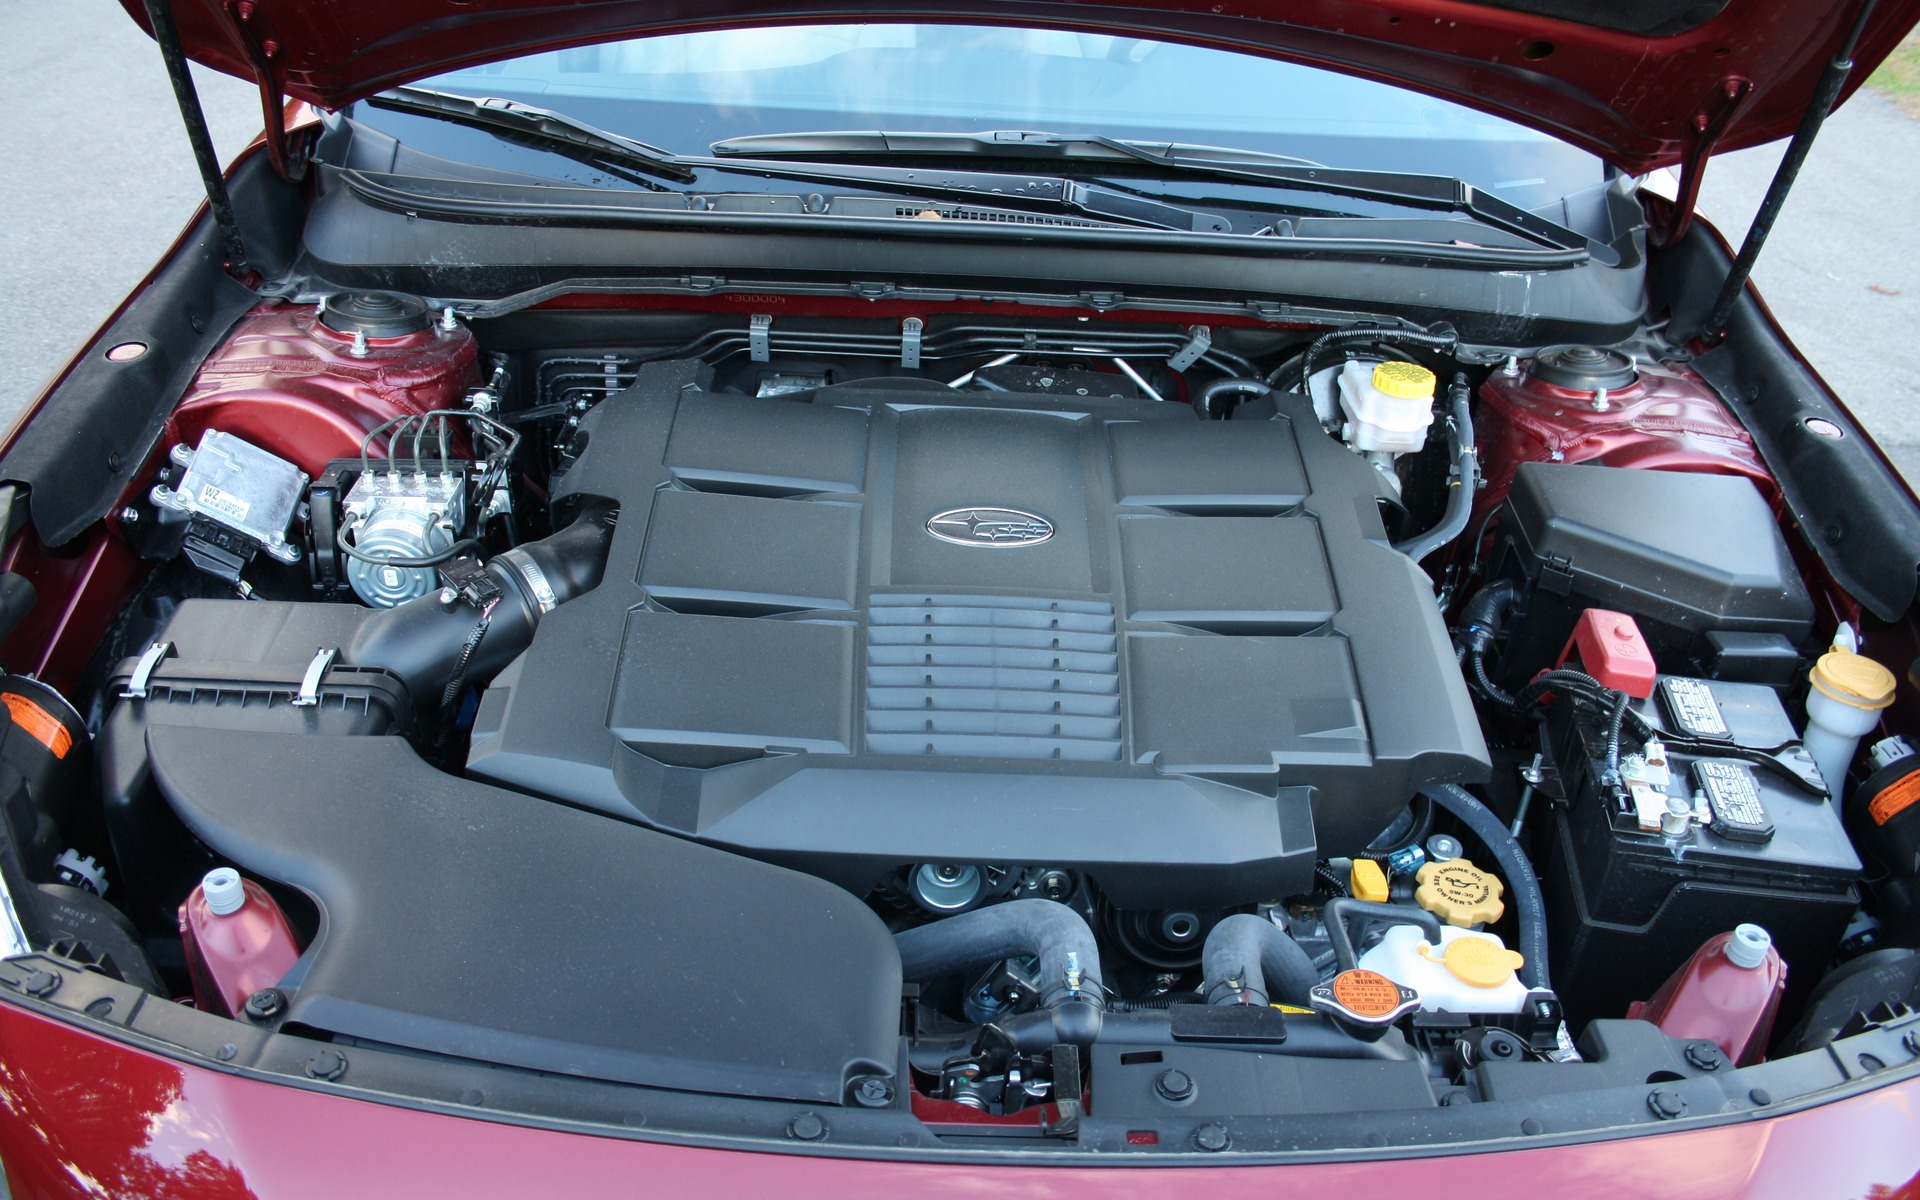 2016 Subaru Outback 3 6r Limited The Nonconformist 4 16